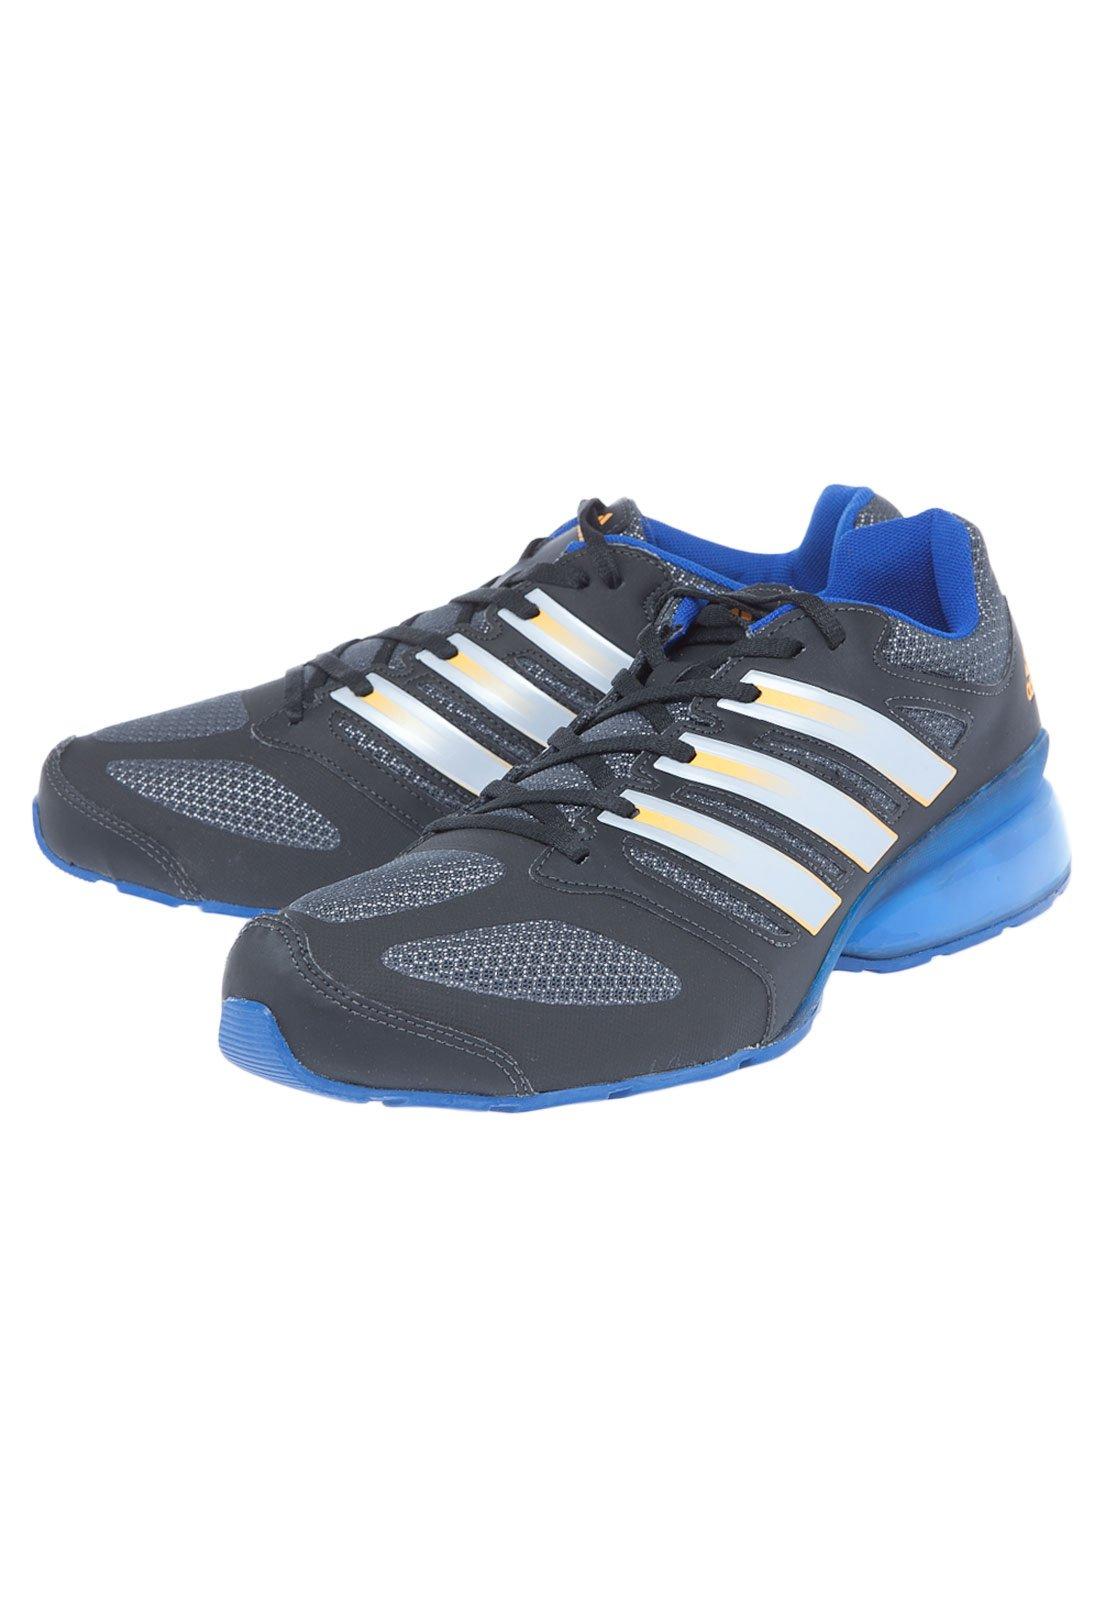 210dfab099e8f adidas cosmic freeze azul